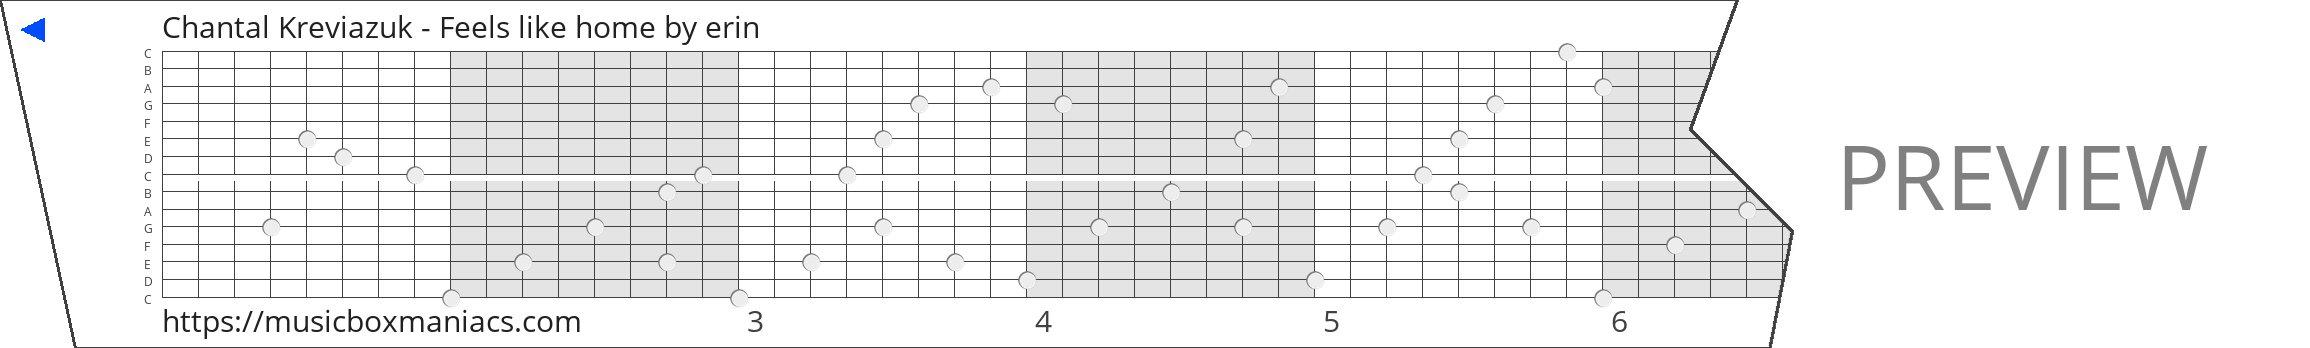 Chantal Kreviazuk - Feels like home 15 note music box paper strip